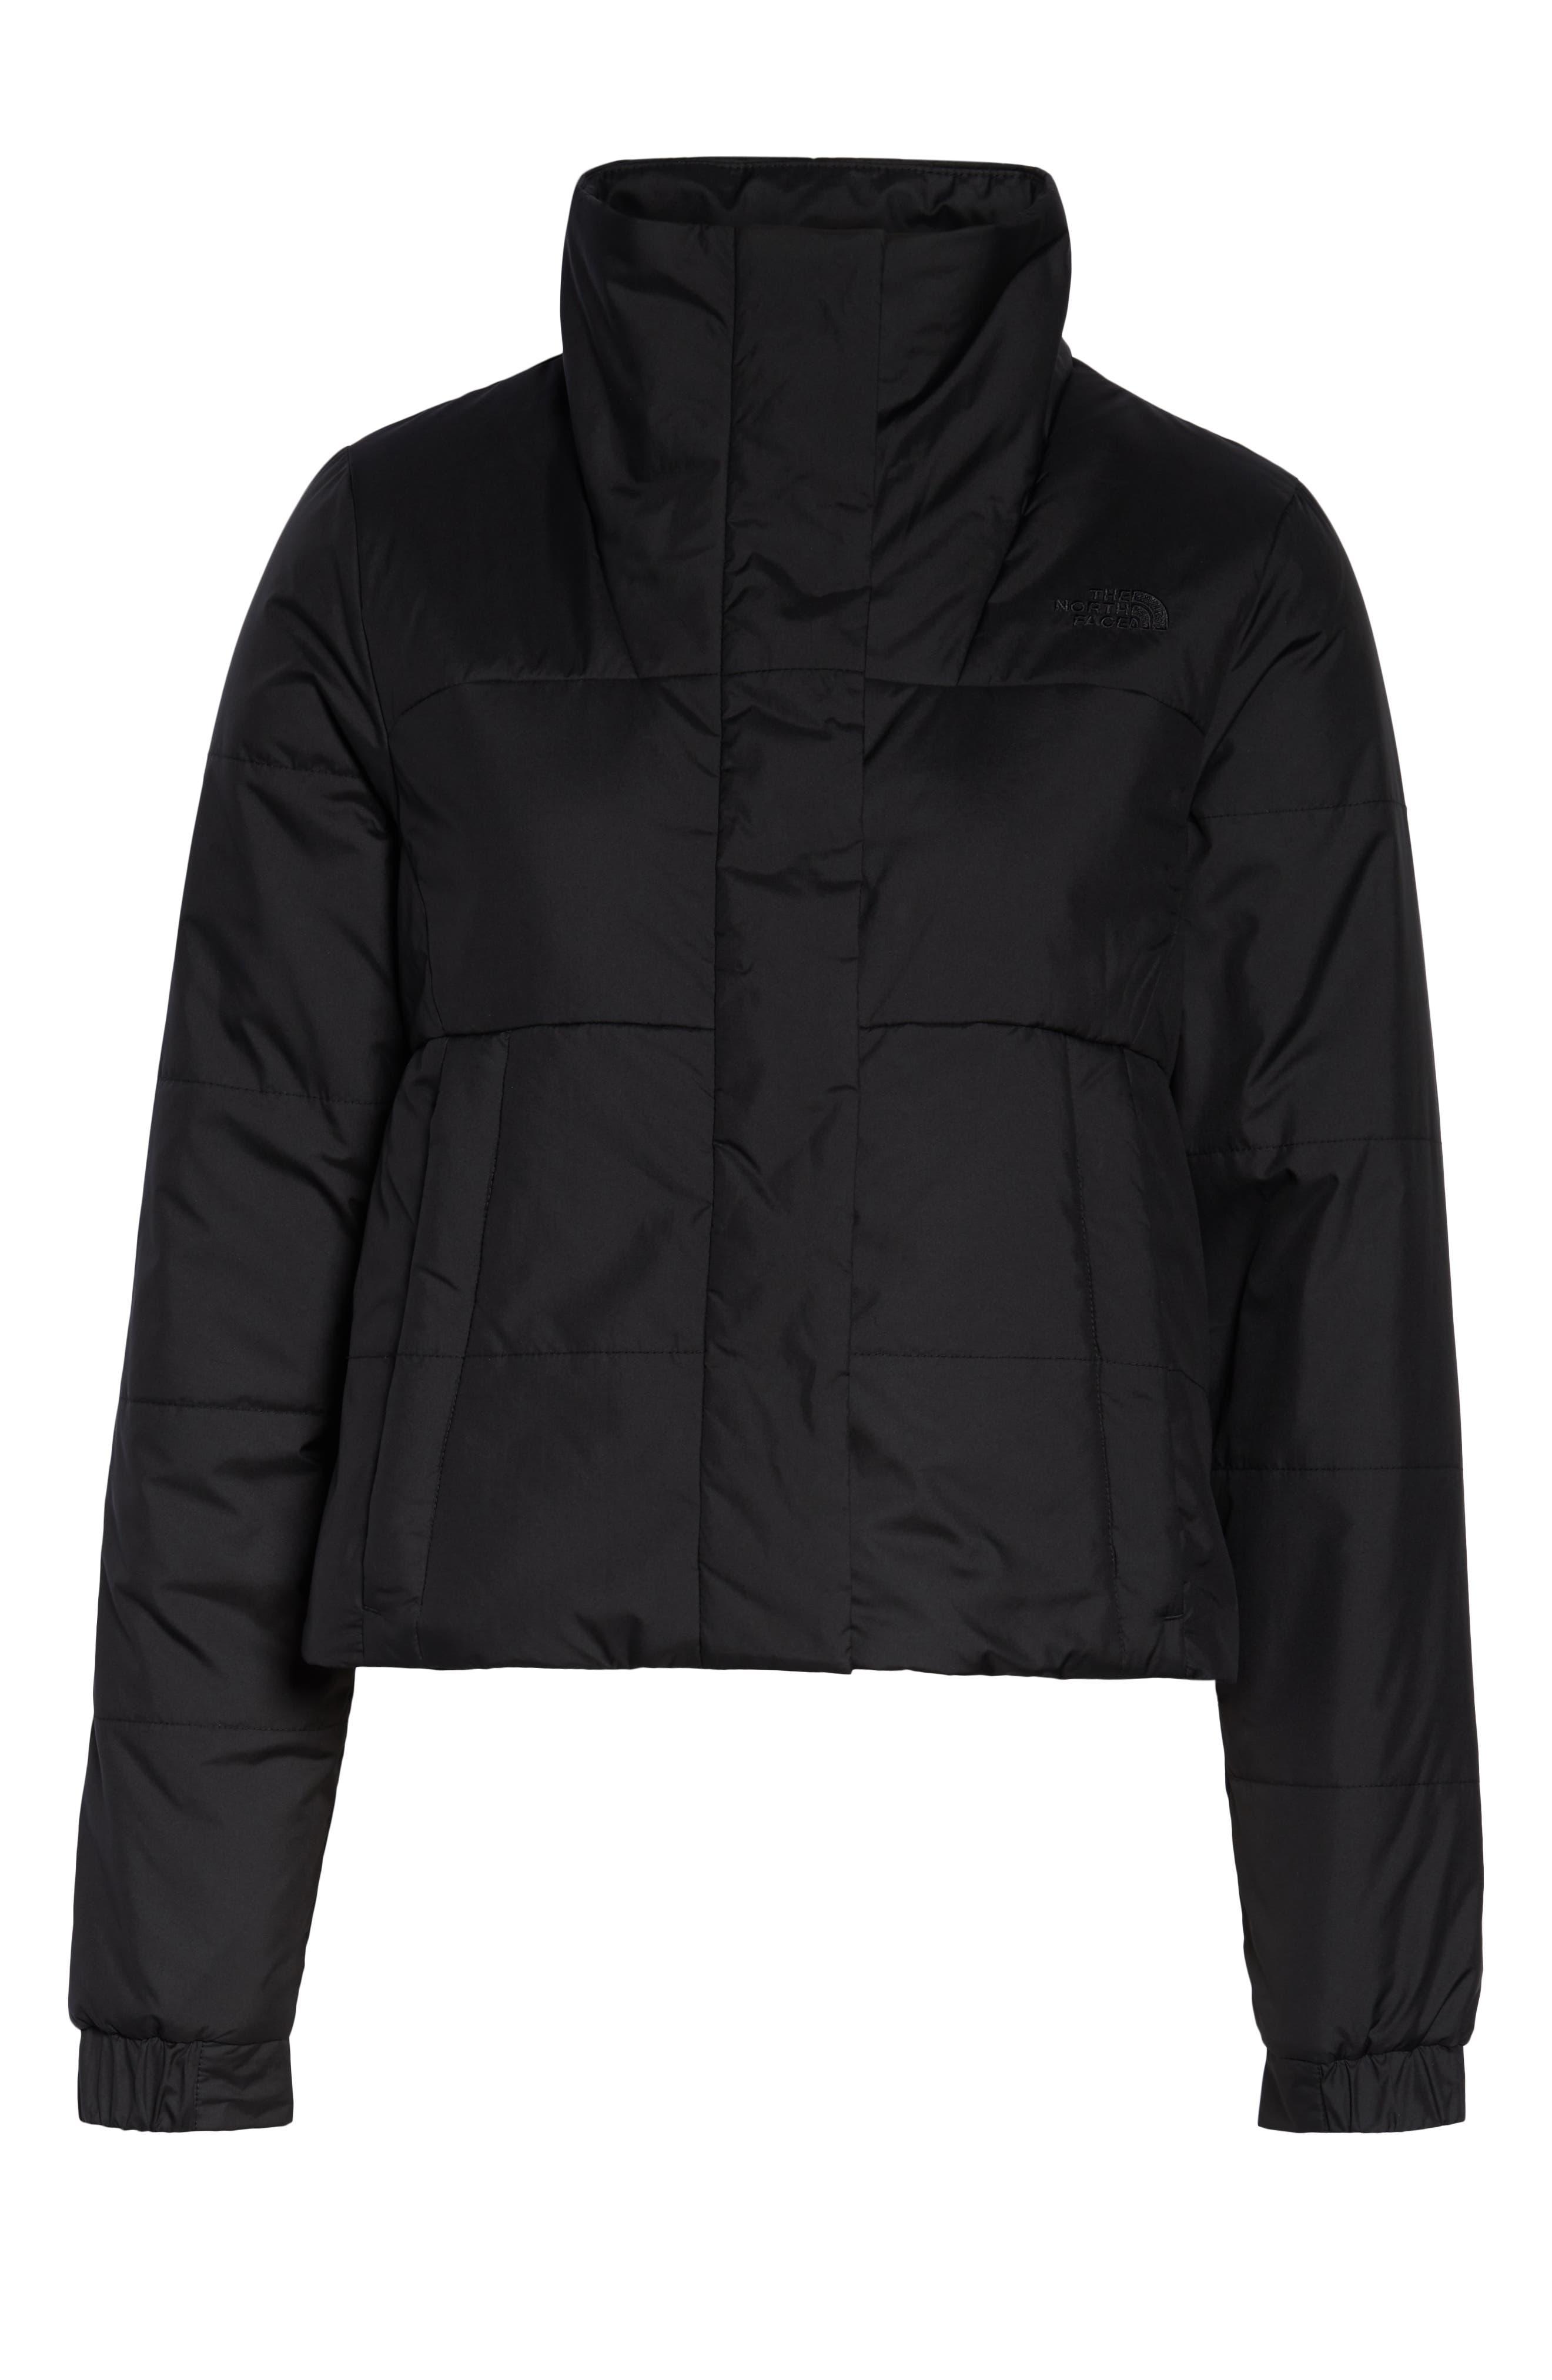 THE NORTH FACE, Femtastic Heatseeker Insulated Jacket, Alternate thumbnail 6, color, TNF BLACK